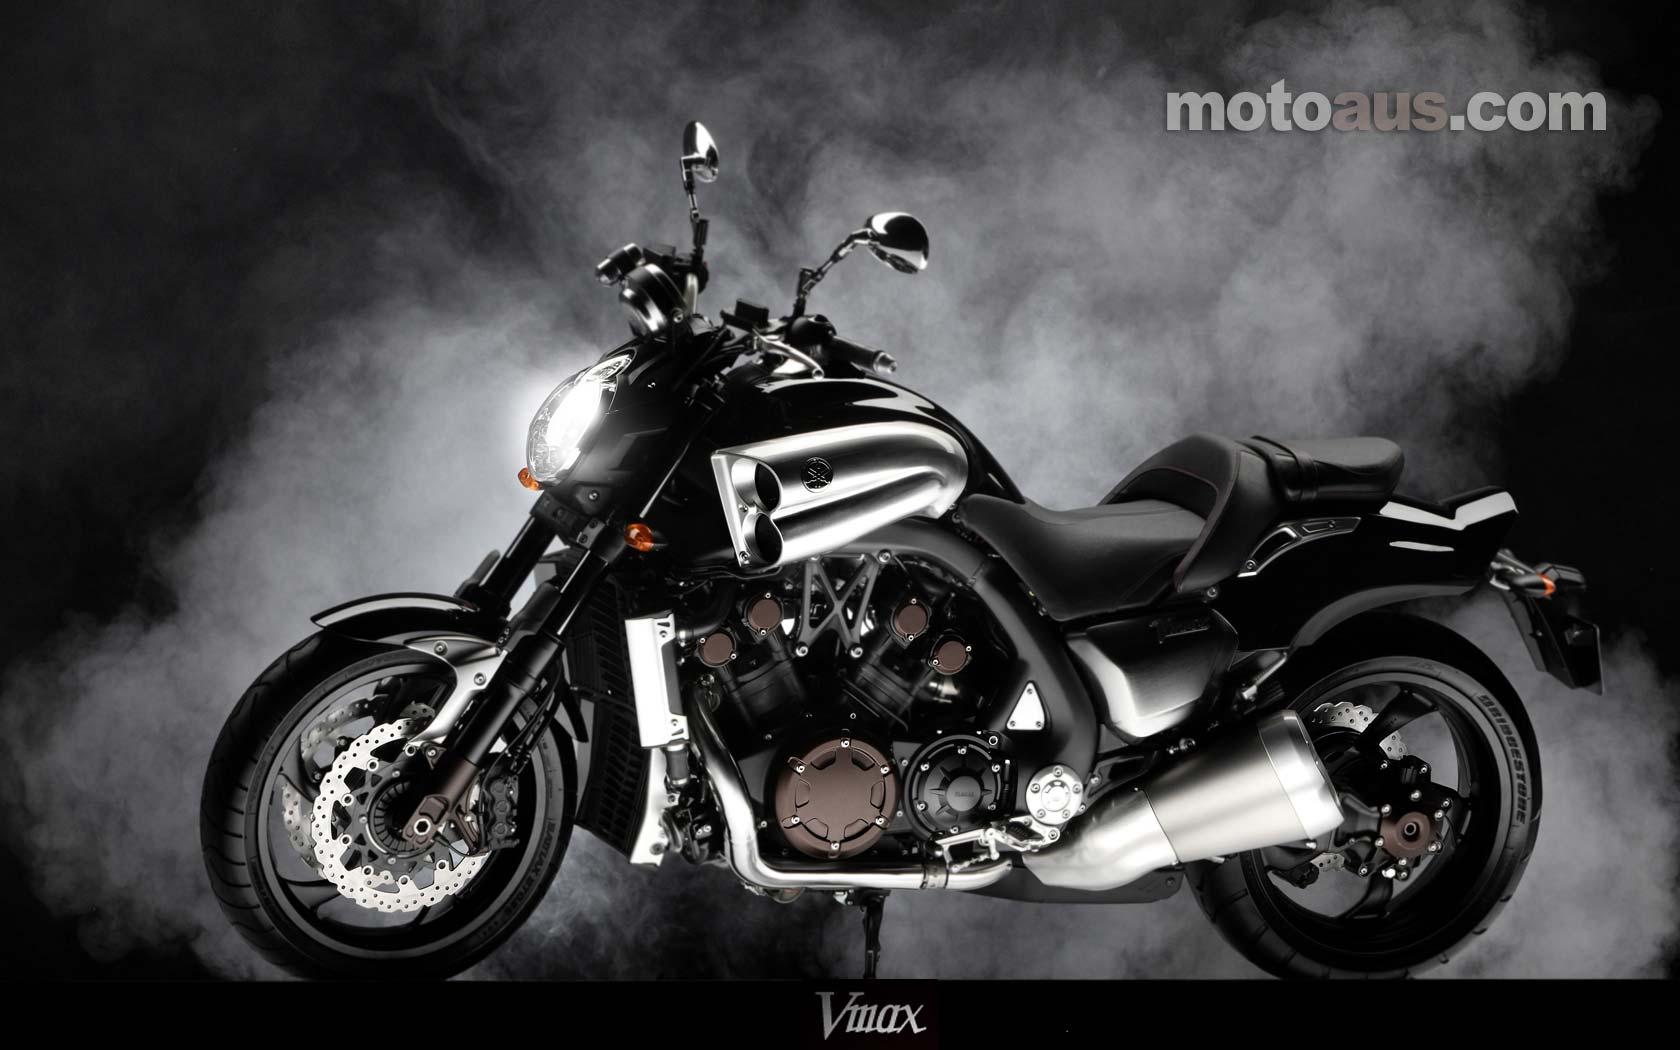 Yamaha 2009 vmax 1680